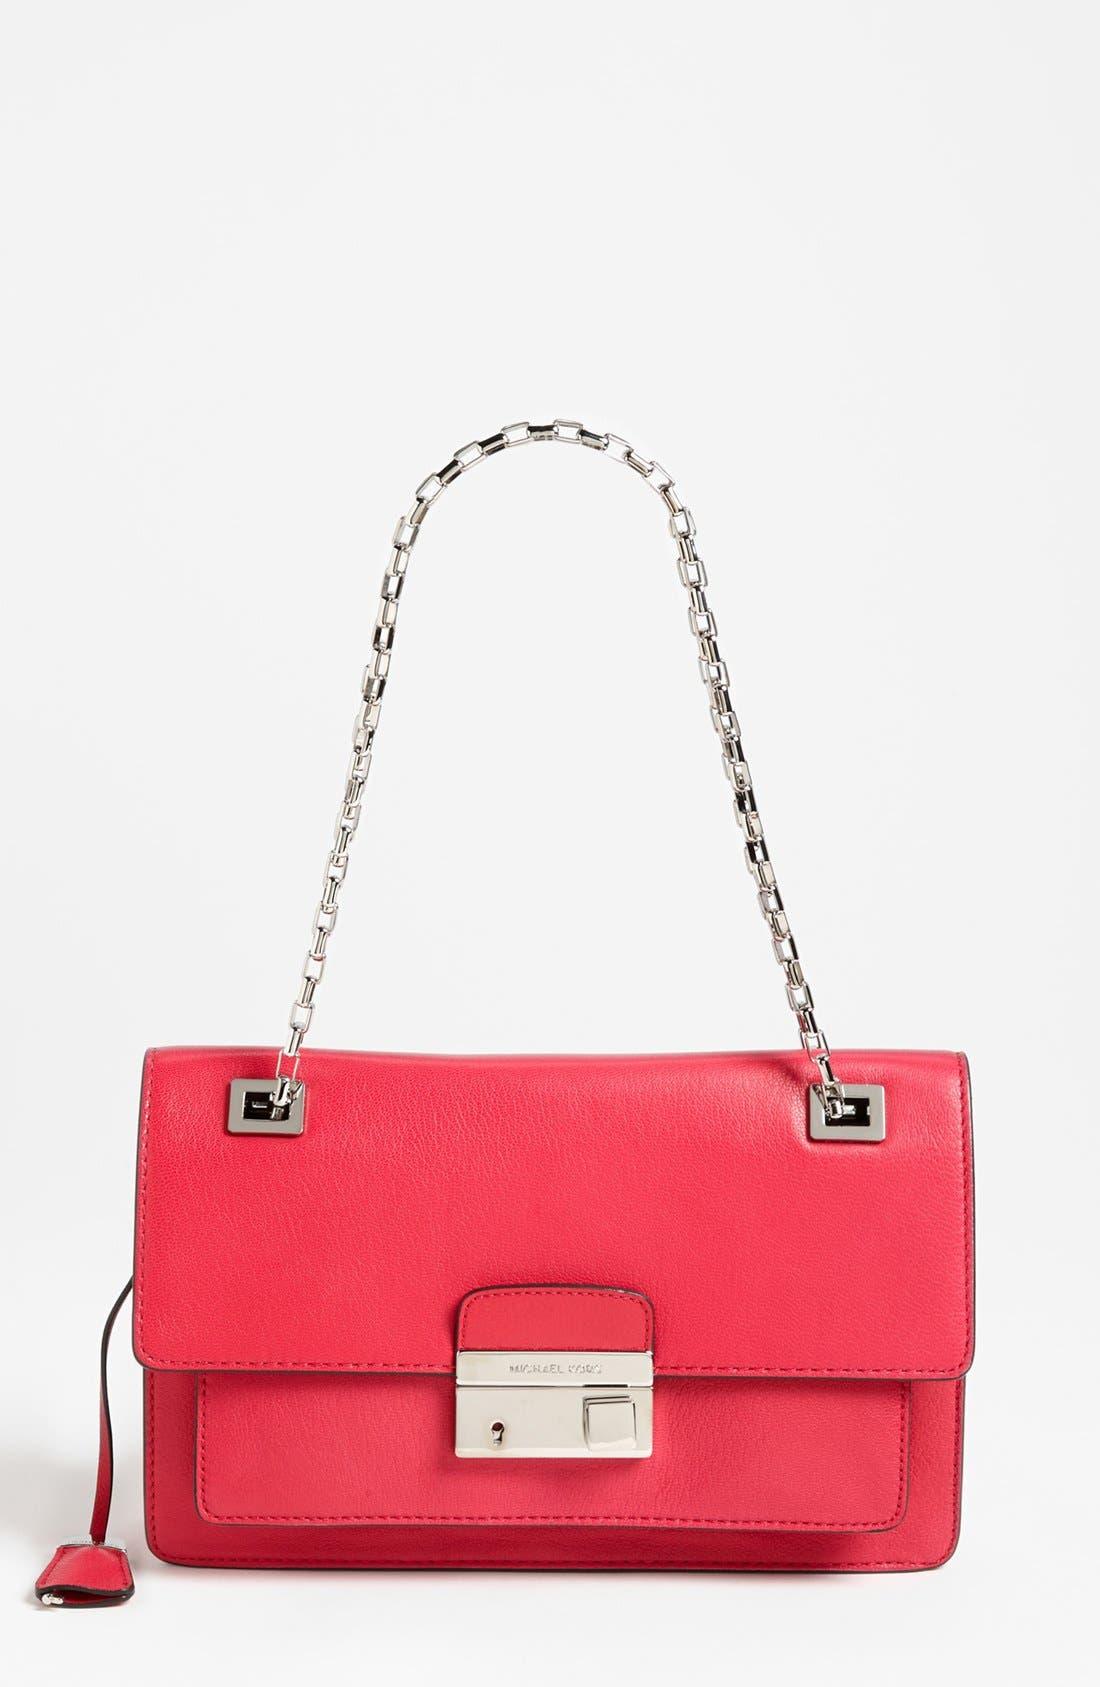 Main Image - Michael Kors 'Gia' Shoulder Bag